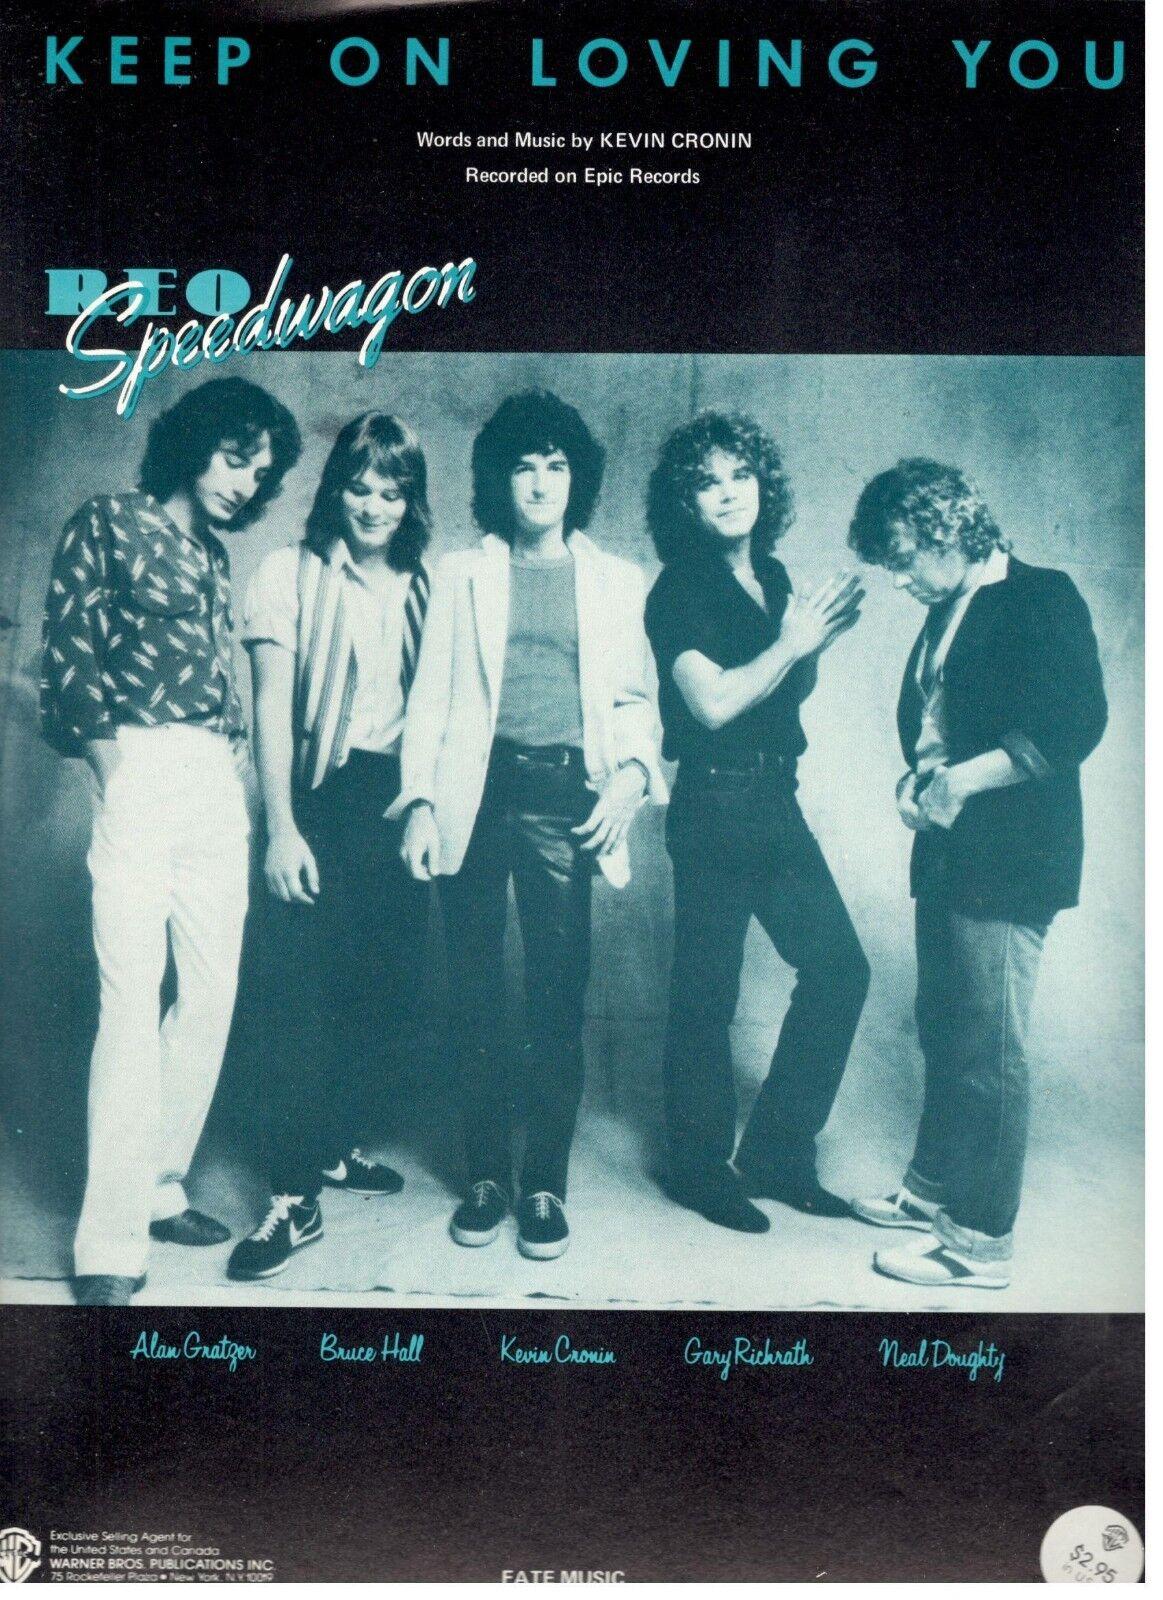 Reo Speedwagon-seguir en Amarte-Partituras-piano Vocal acordes de de de guitarra - 1981-NEW  muchas sorpresas